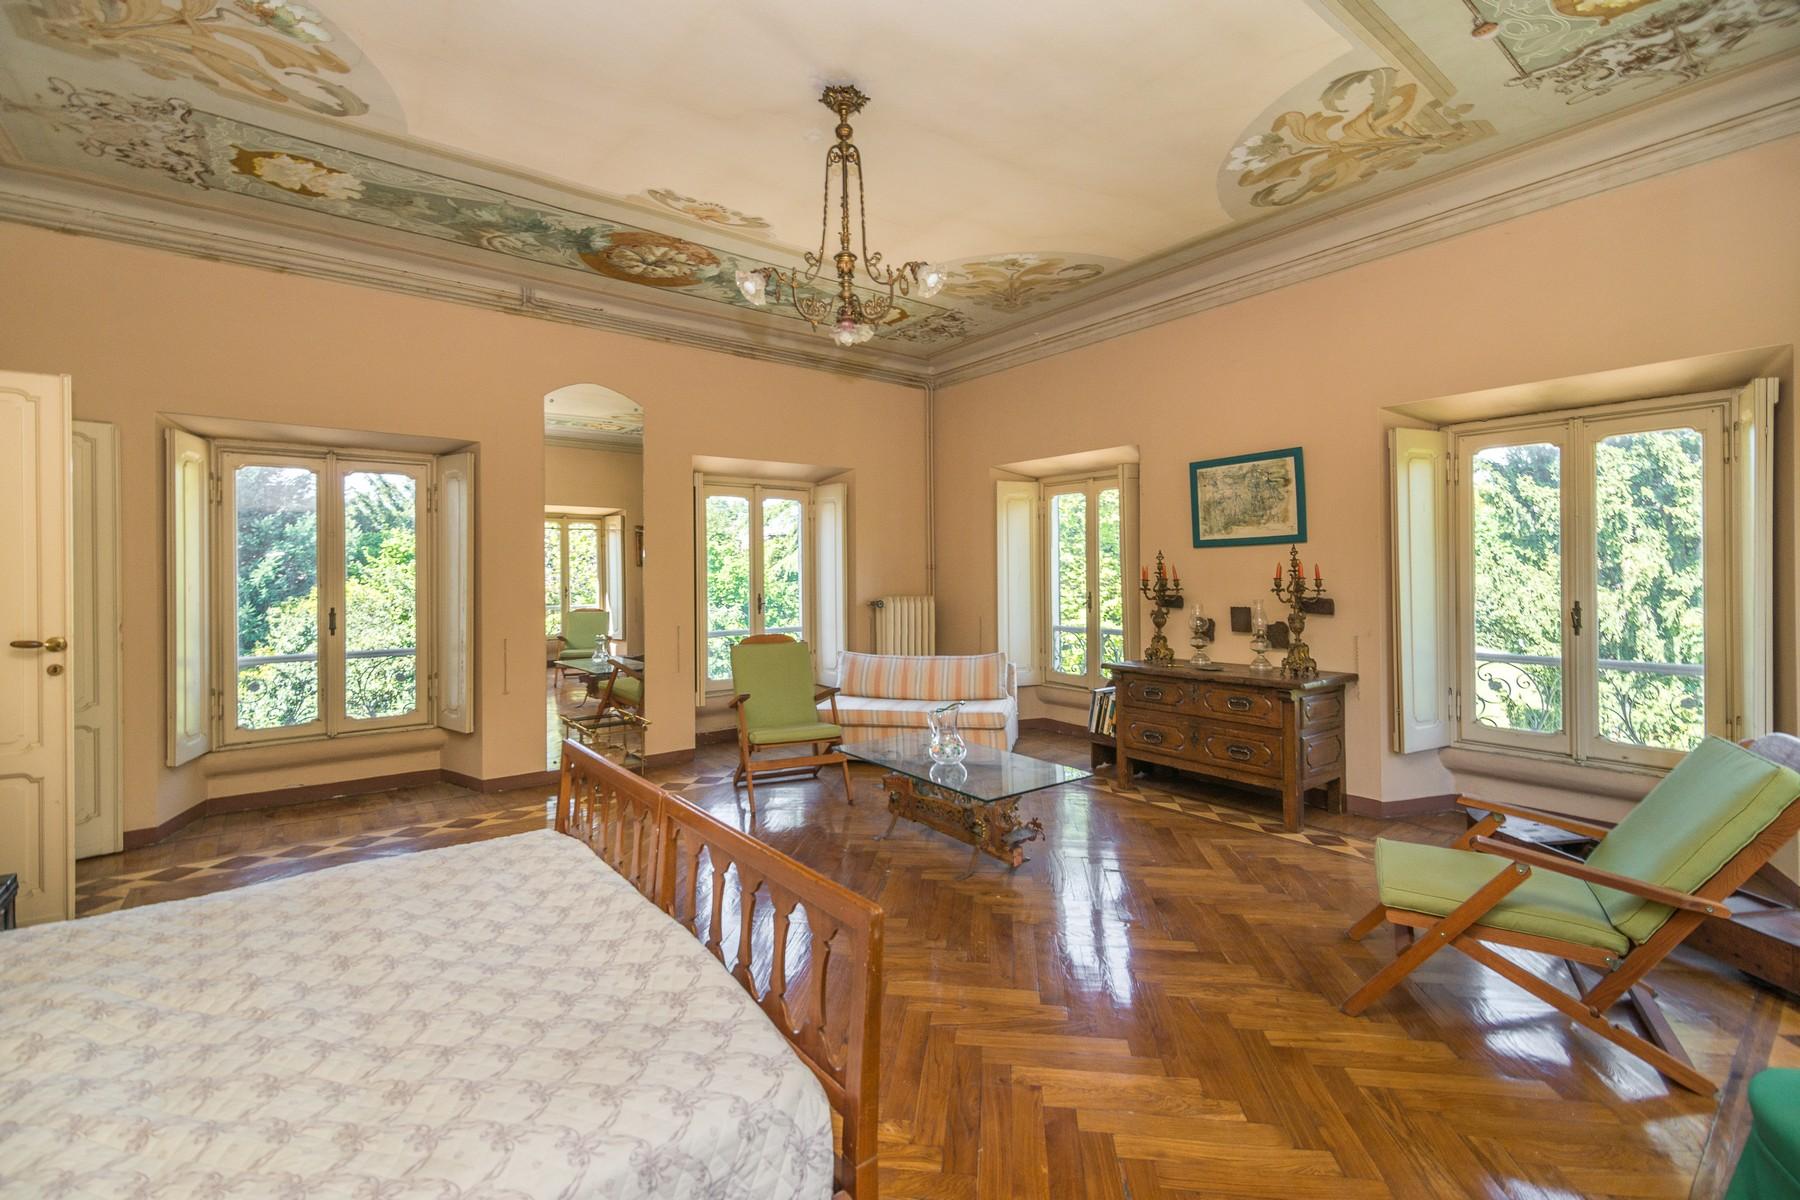 Villa in Vendita a Varese: 5 locali, 1500 mq - Foto 17